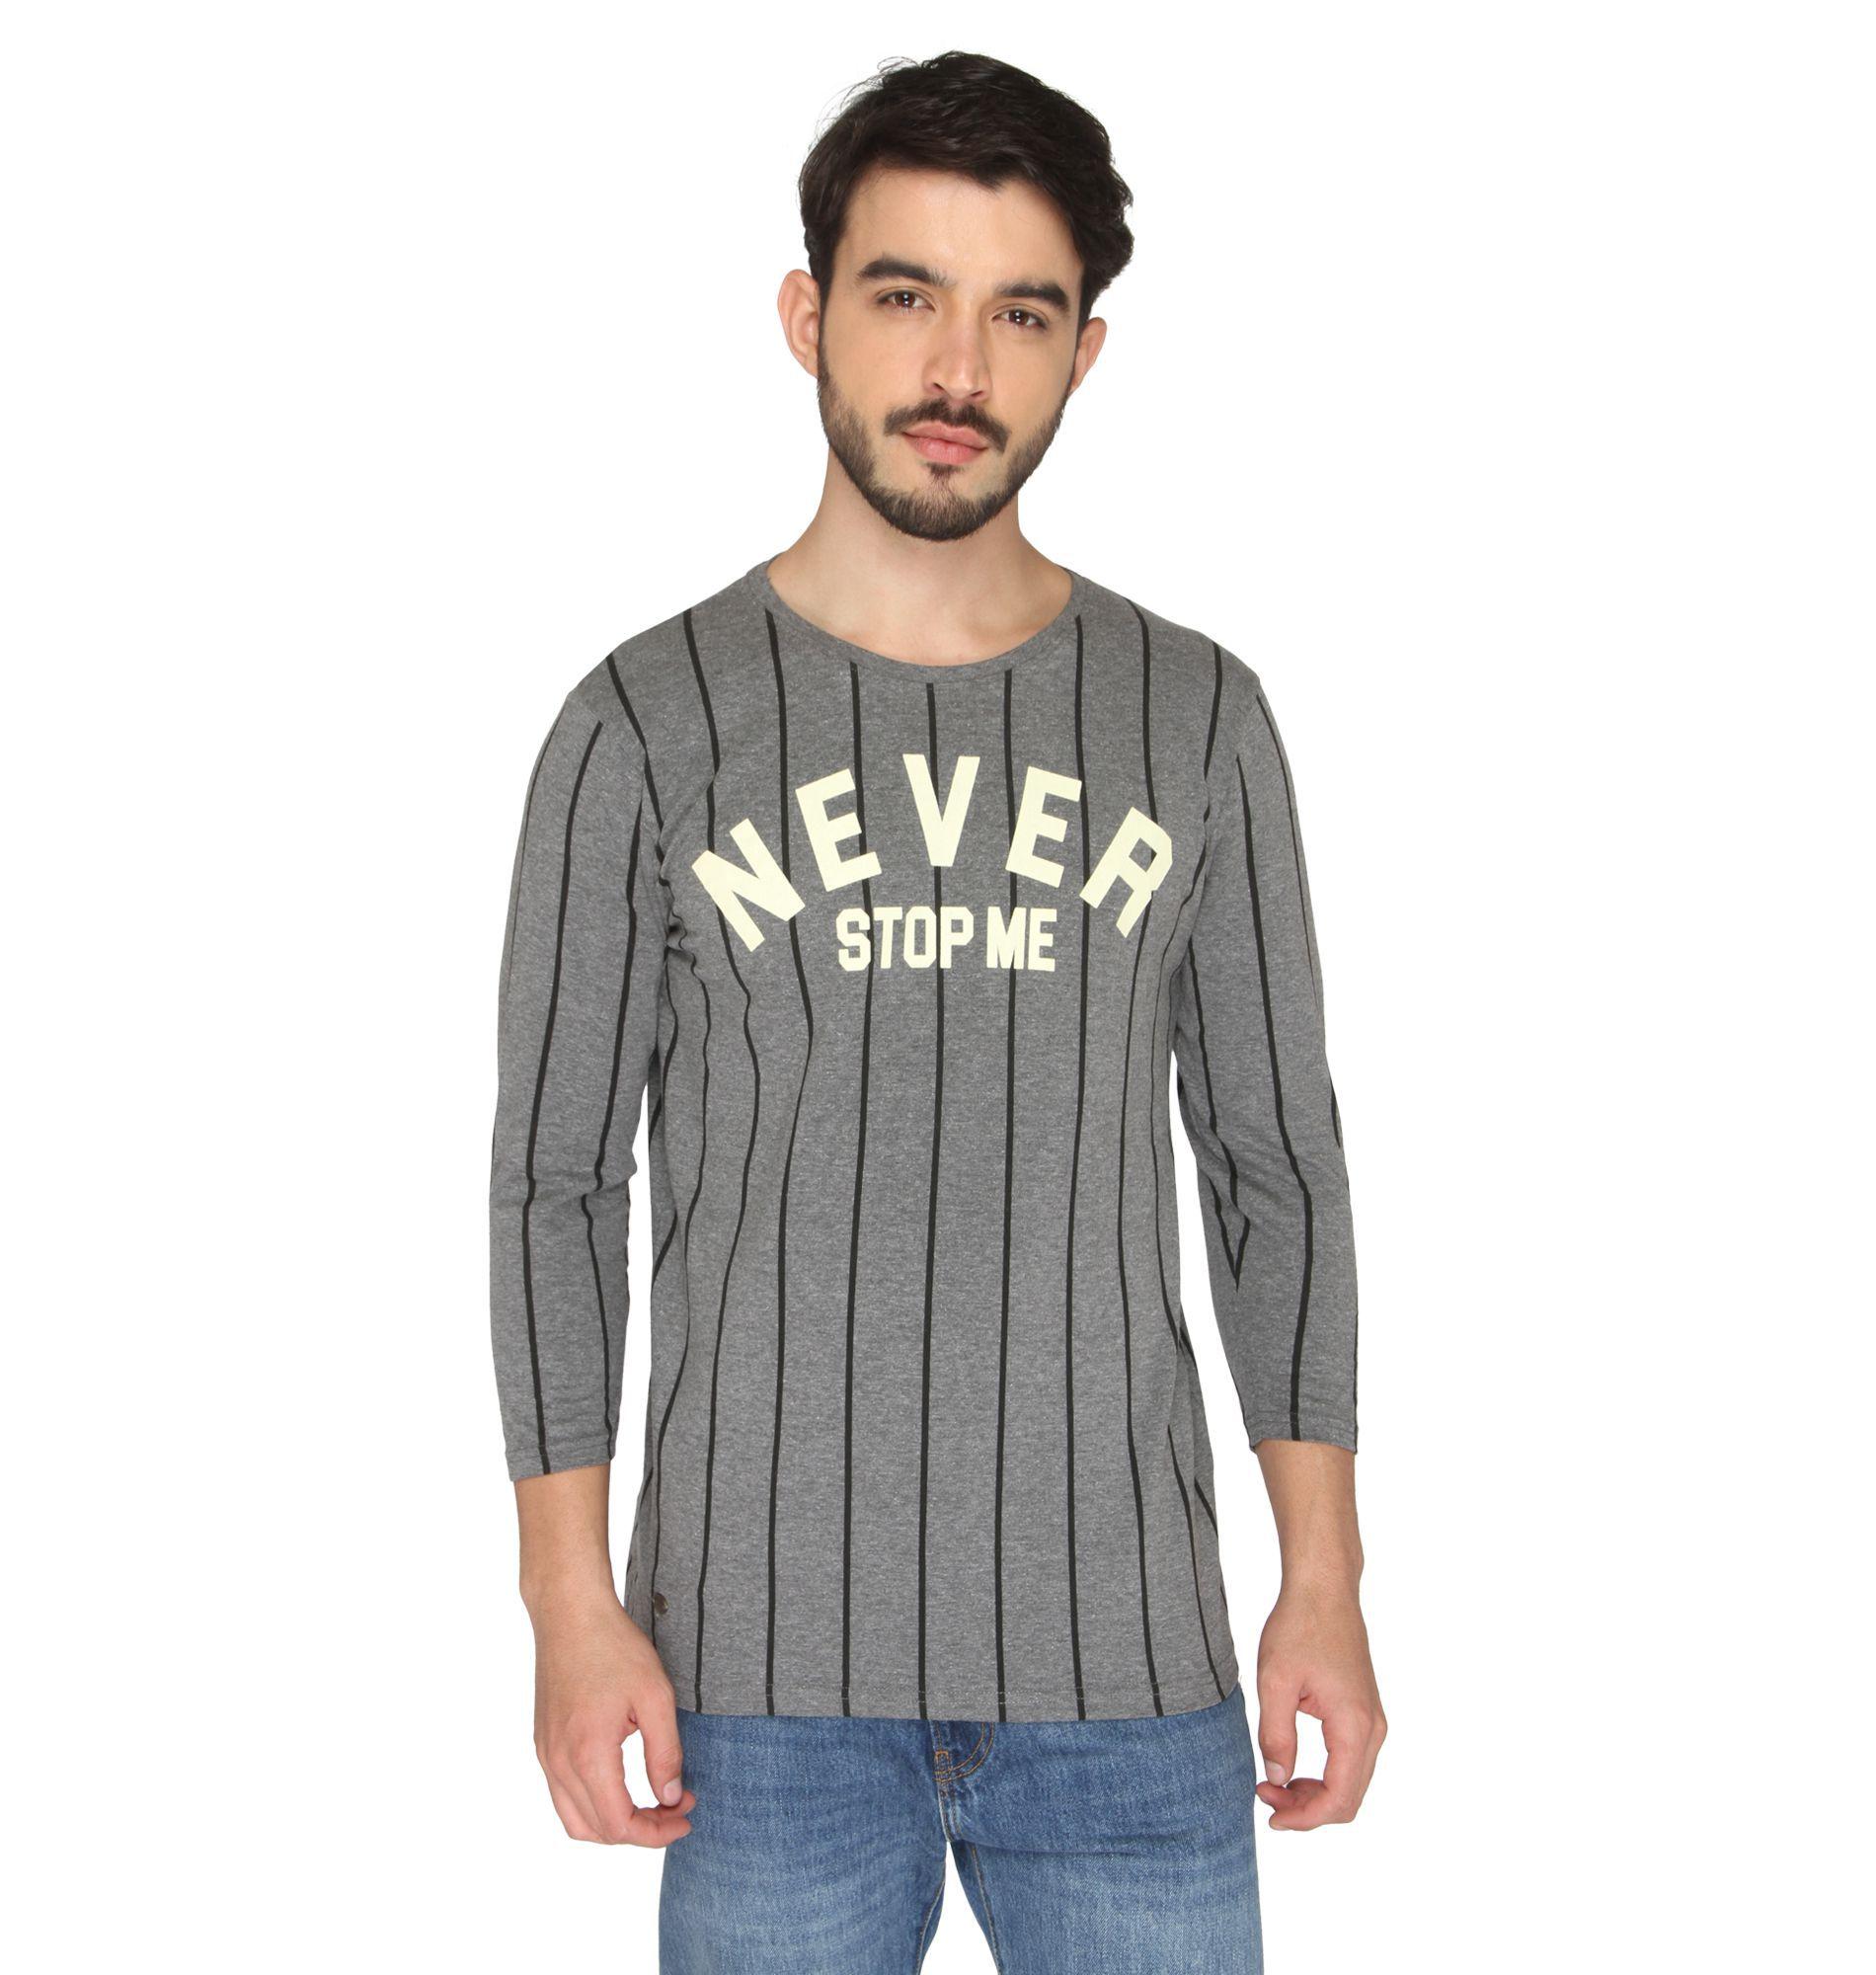 Drastic Black Round T-Shirt